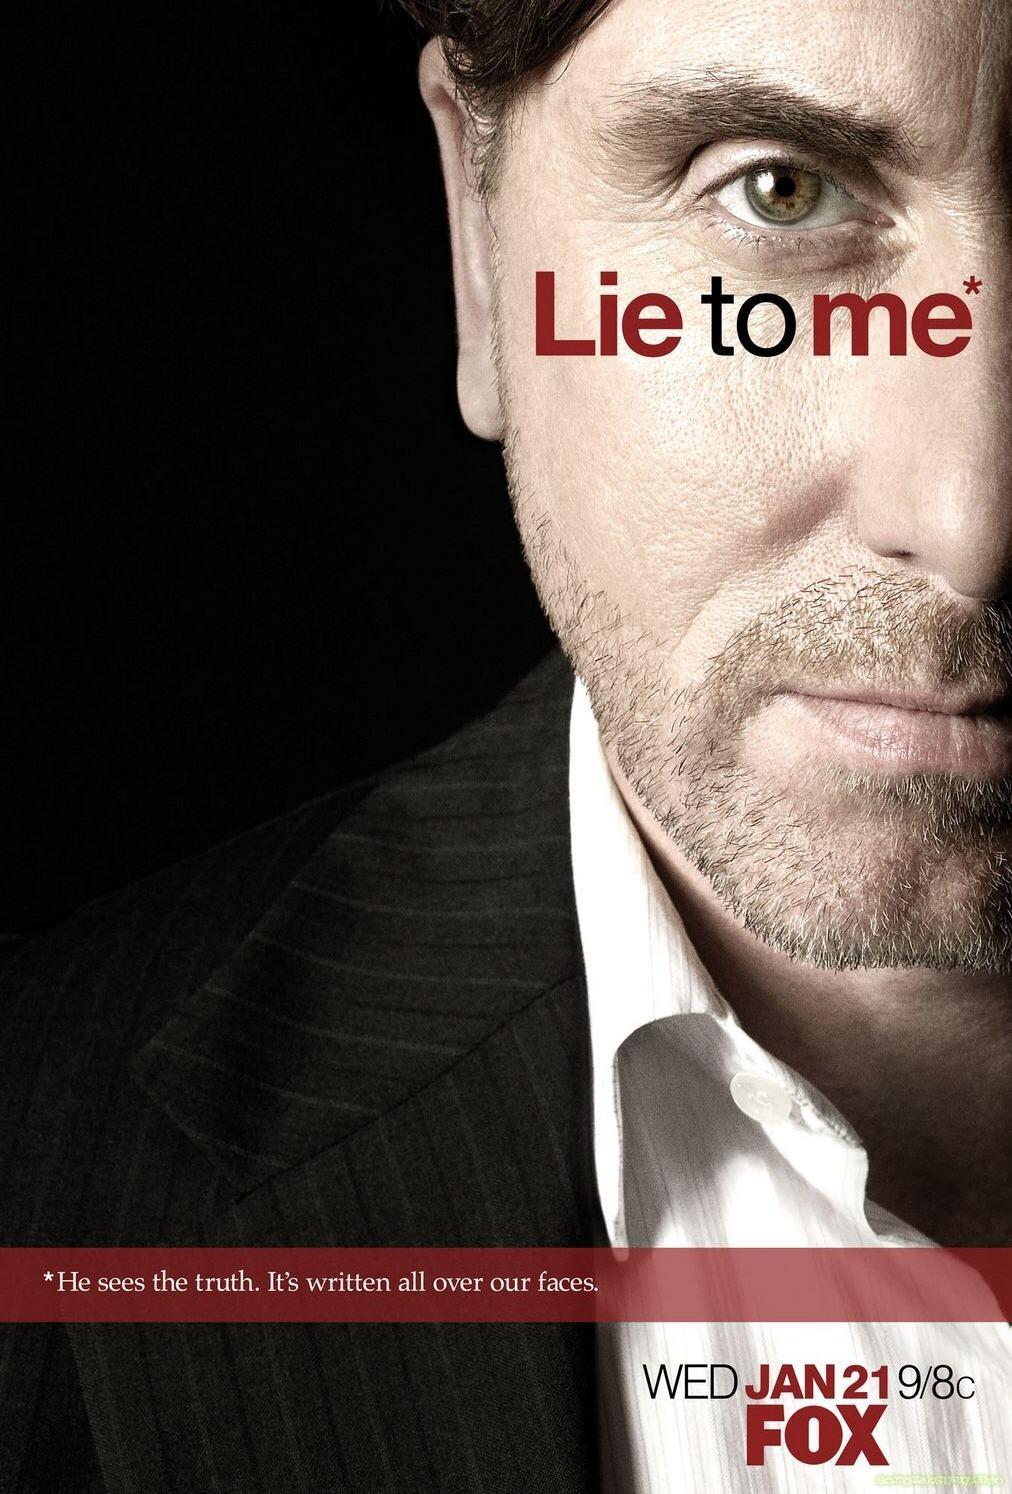 Hazudj, ha tudsz!